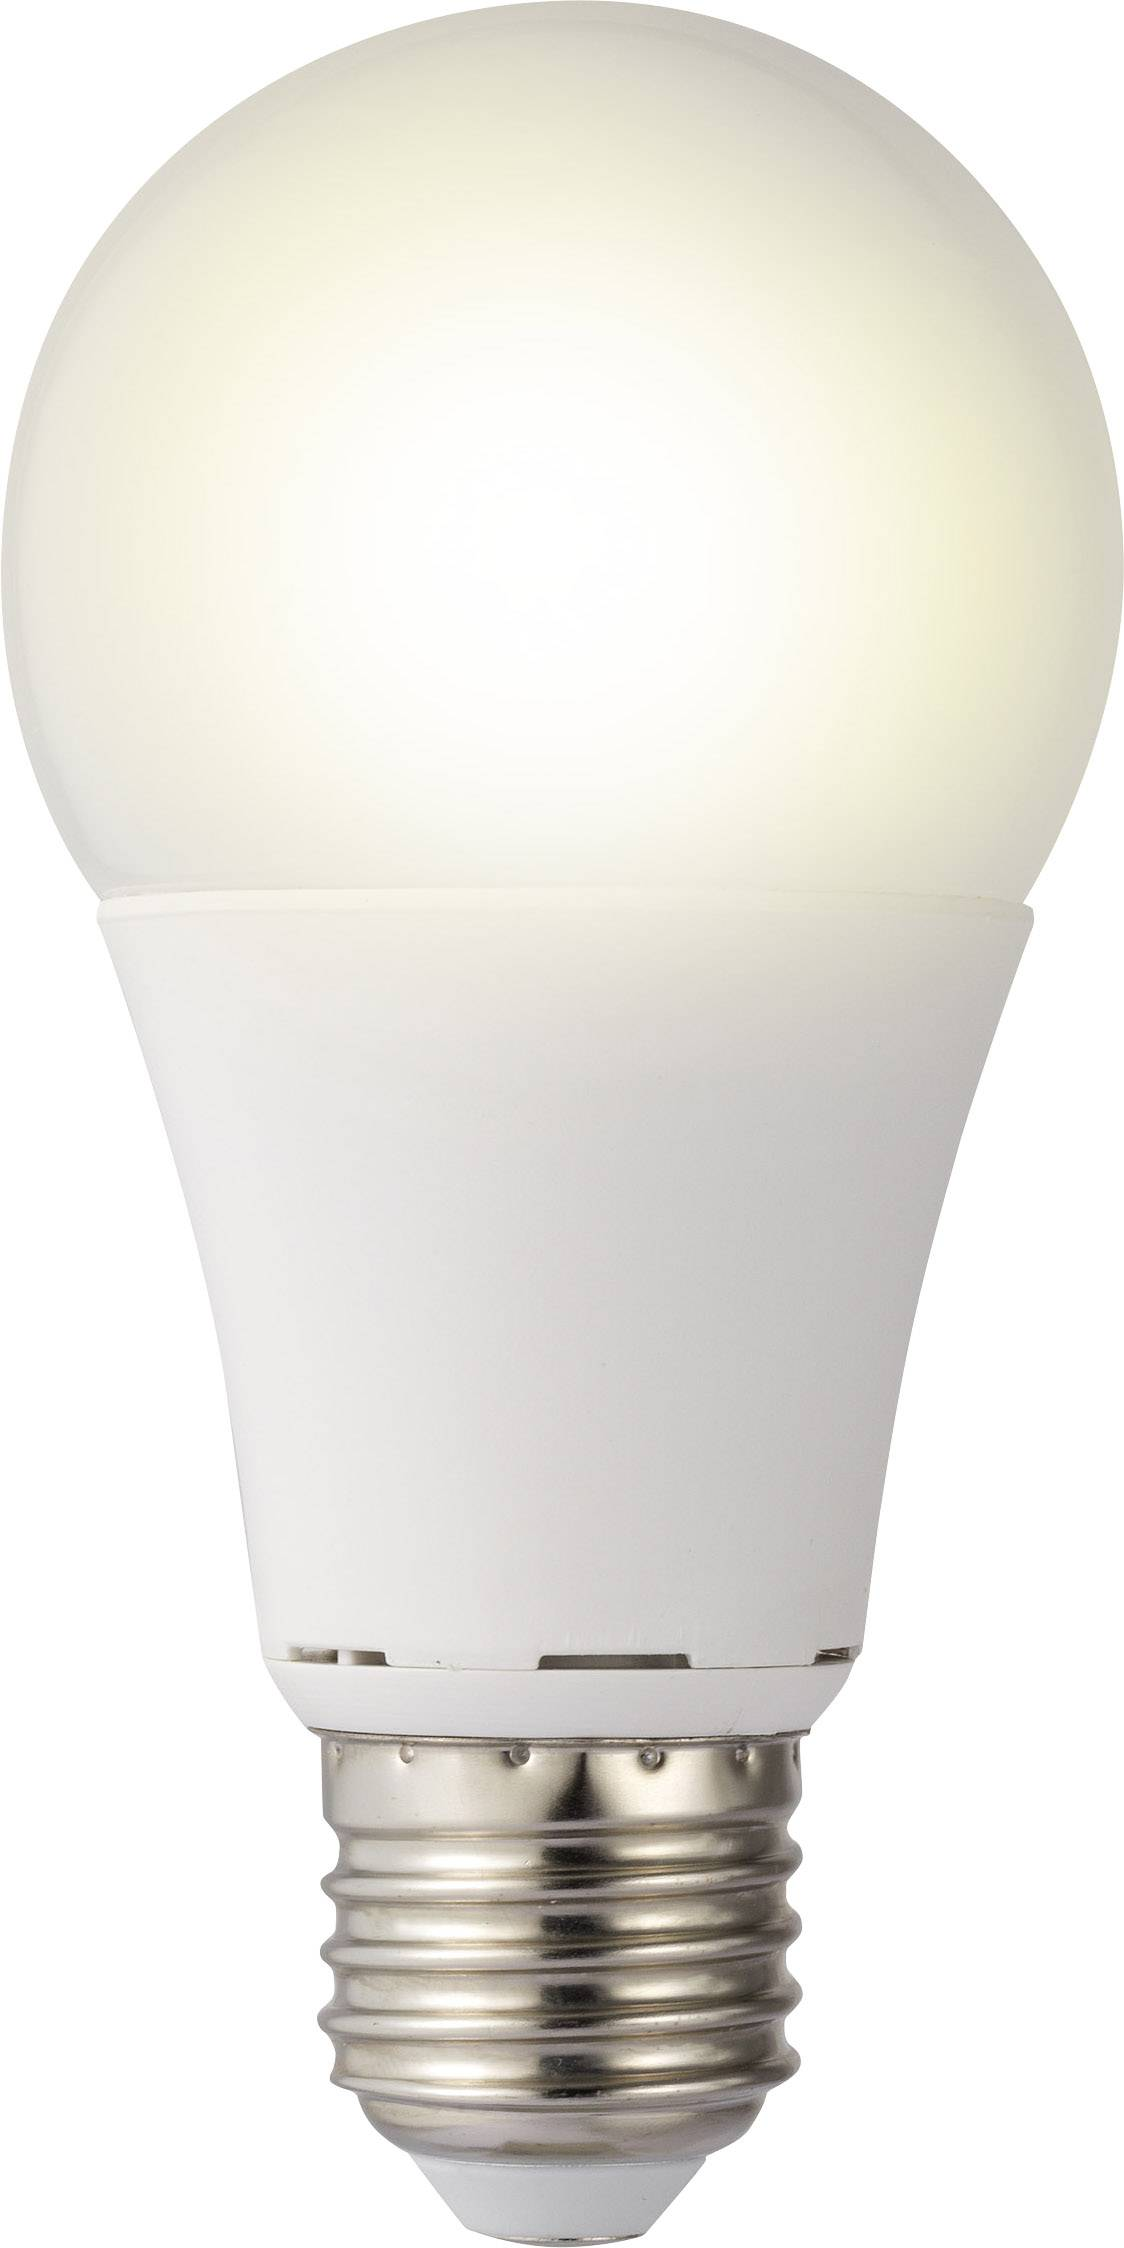 LED žiarovka 119 mm sygonix 230 V E27 9.5 W = 60 W 1 ks